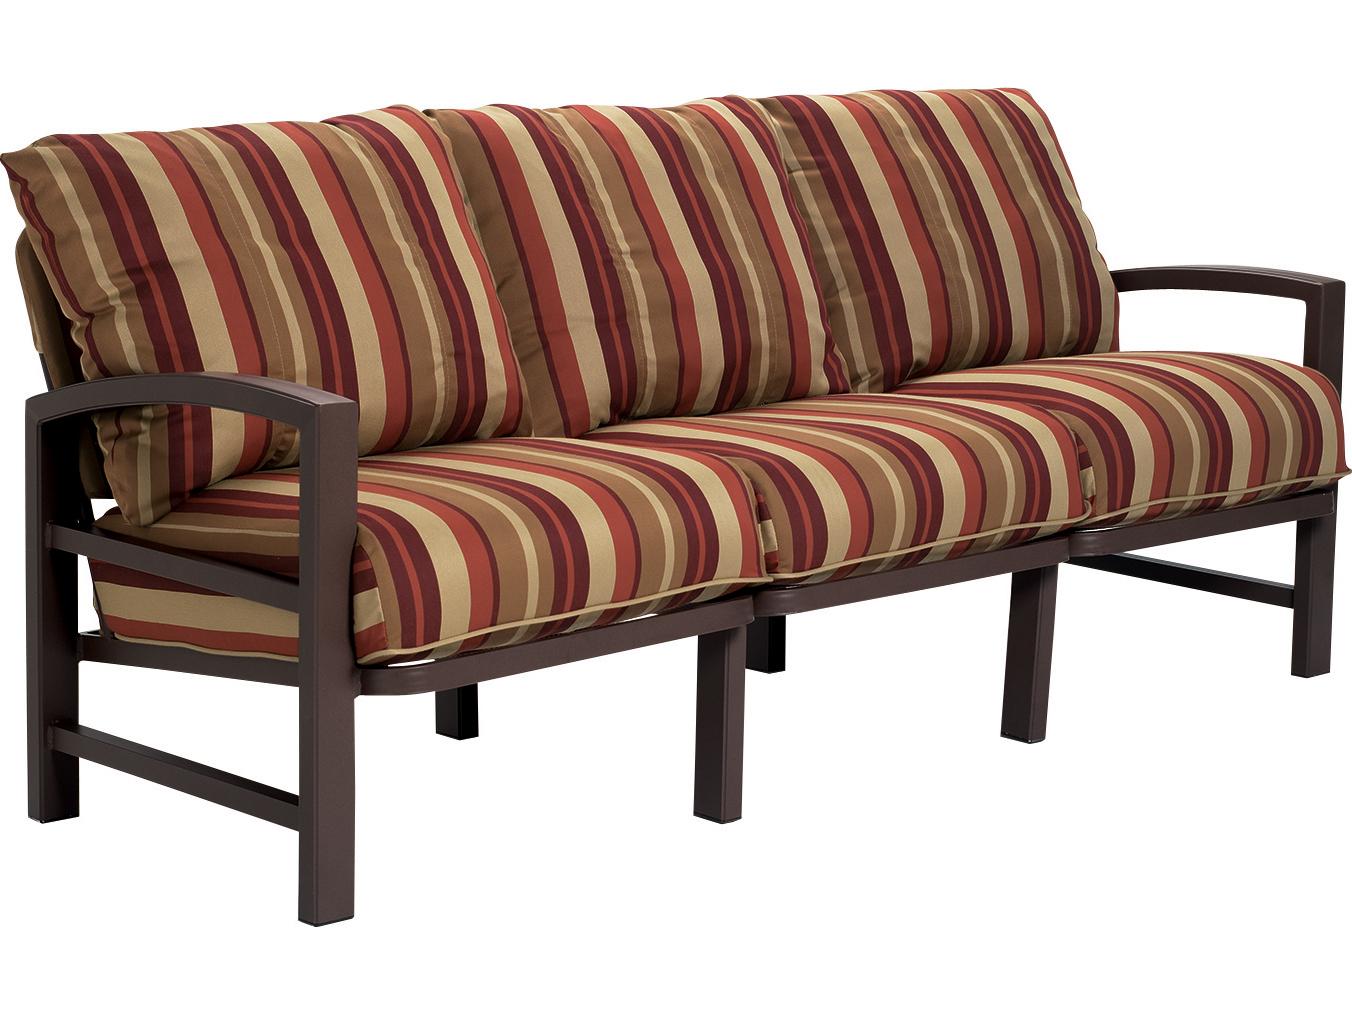 Tropitone Lakeside Cushion Sofa Replacement Cushions